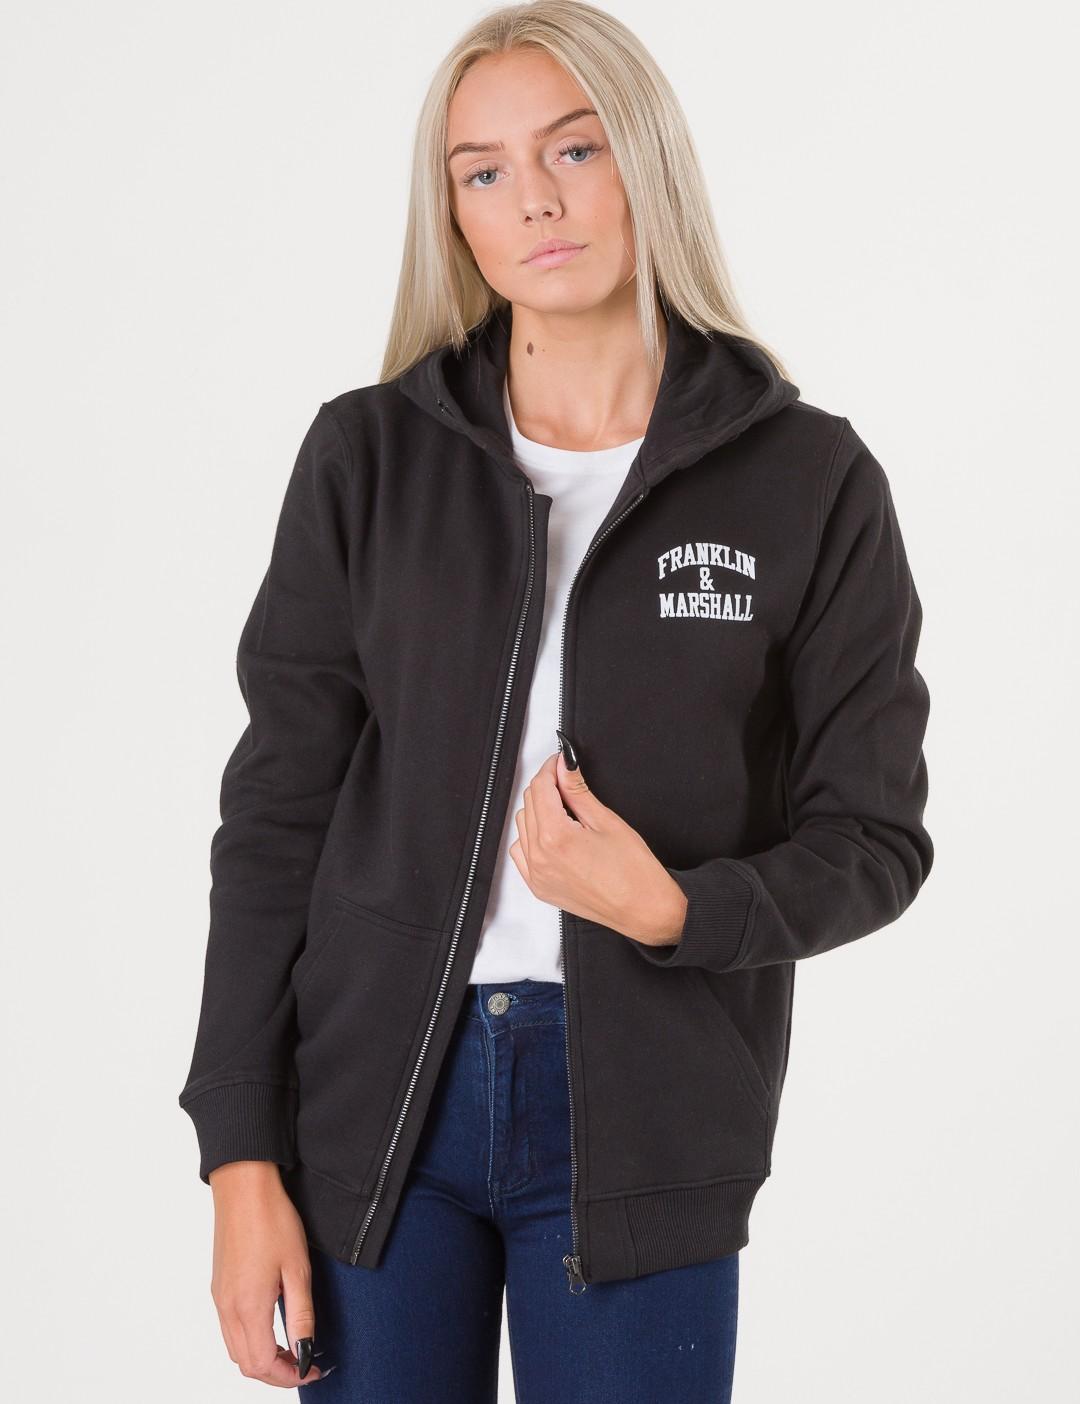 Best pris på Franklin & Marshall Varsity Style Jacket (Herre